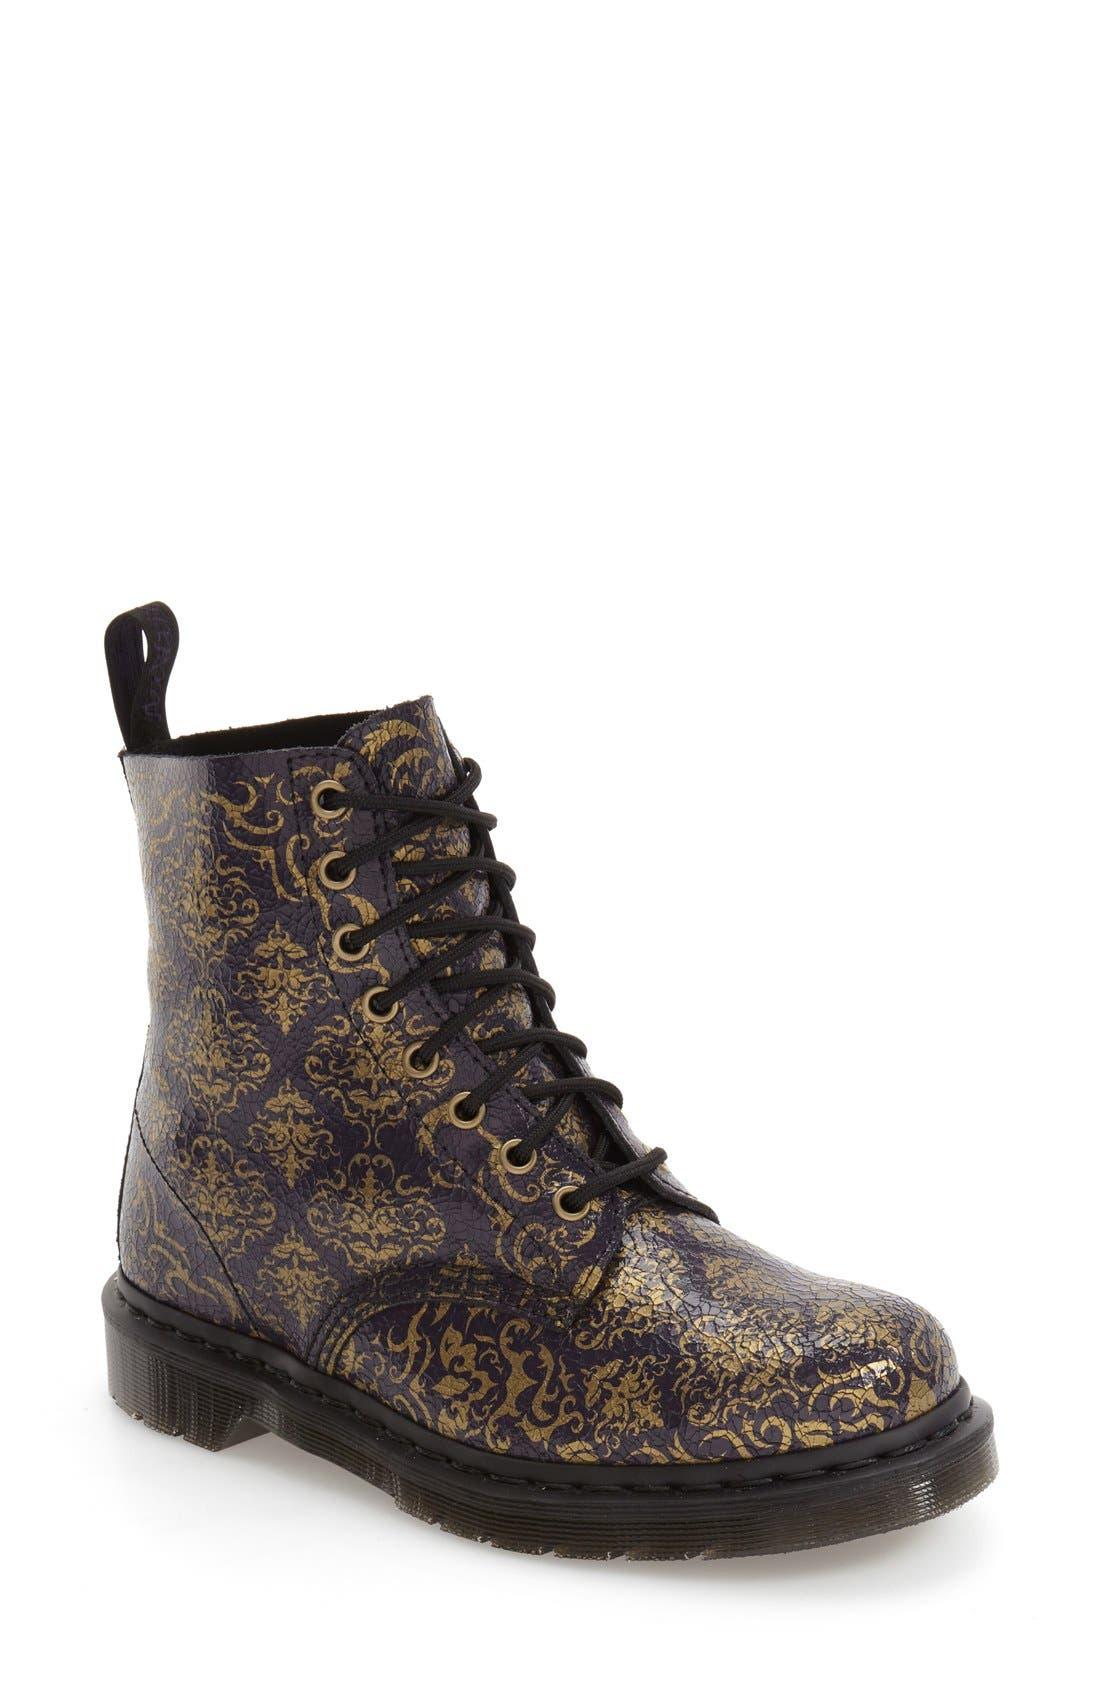 Main Image - Dr. Martens 'Pascal' Boot (Women)